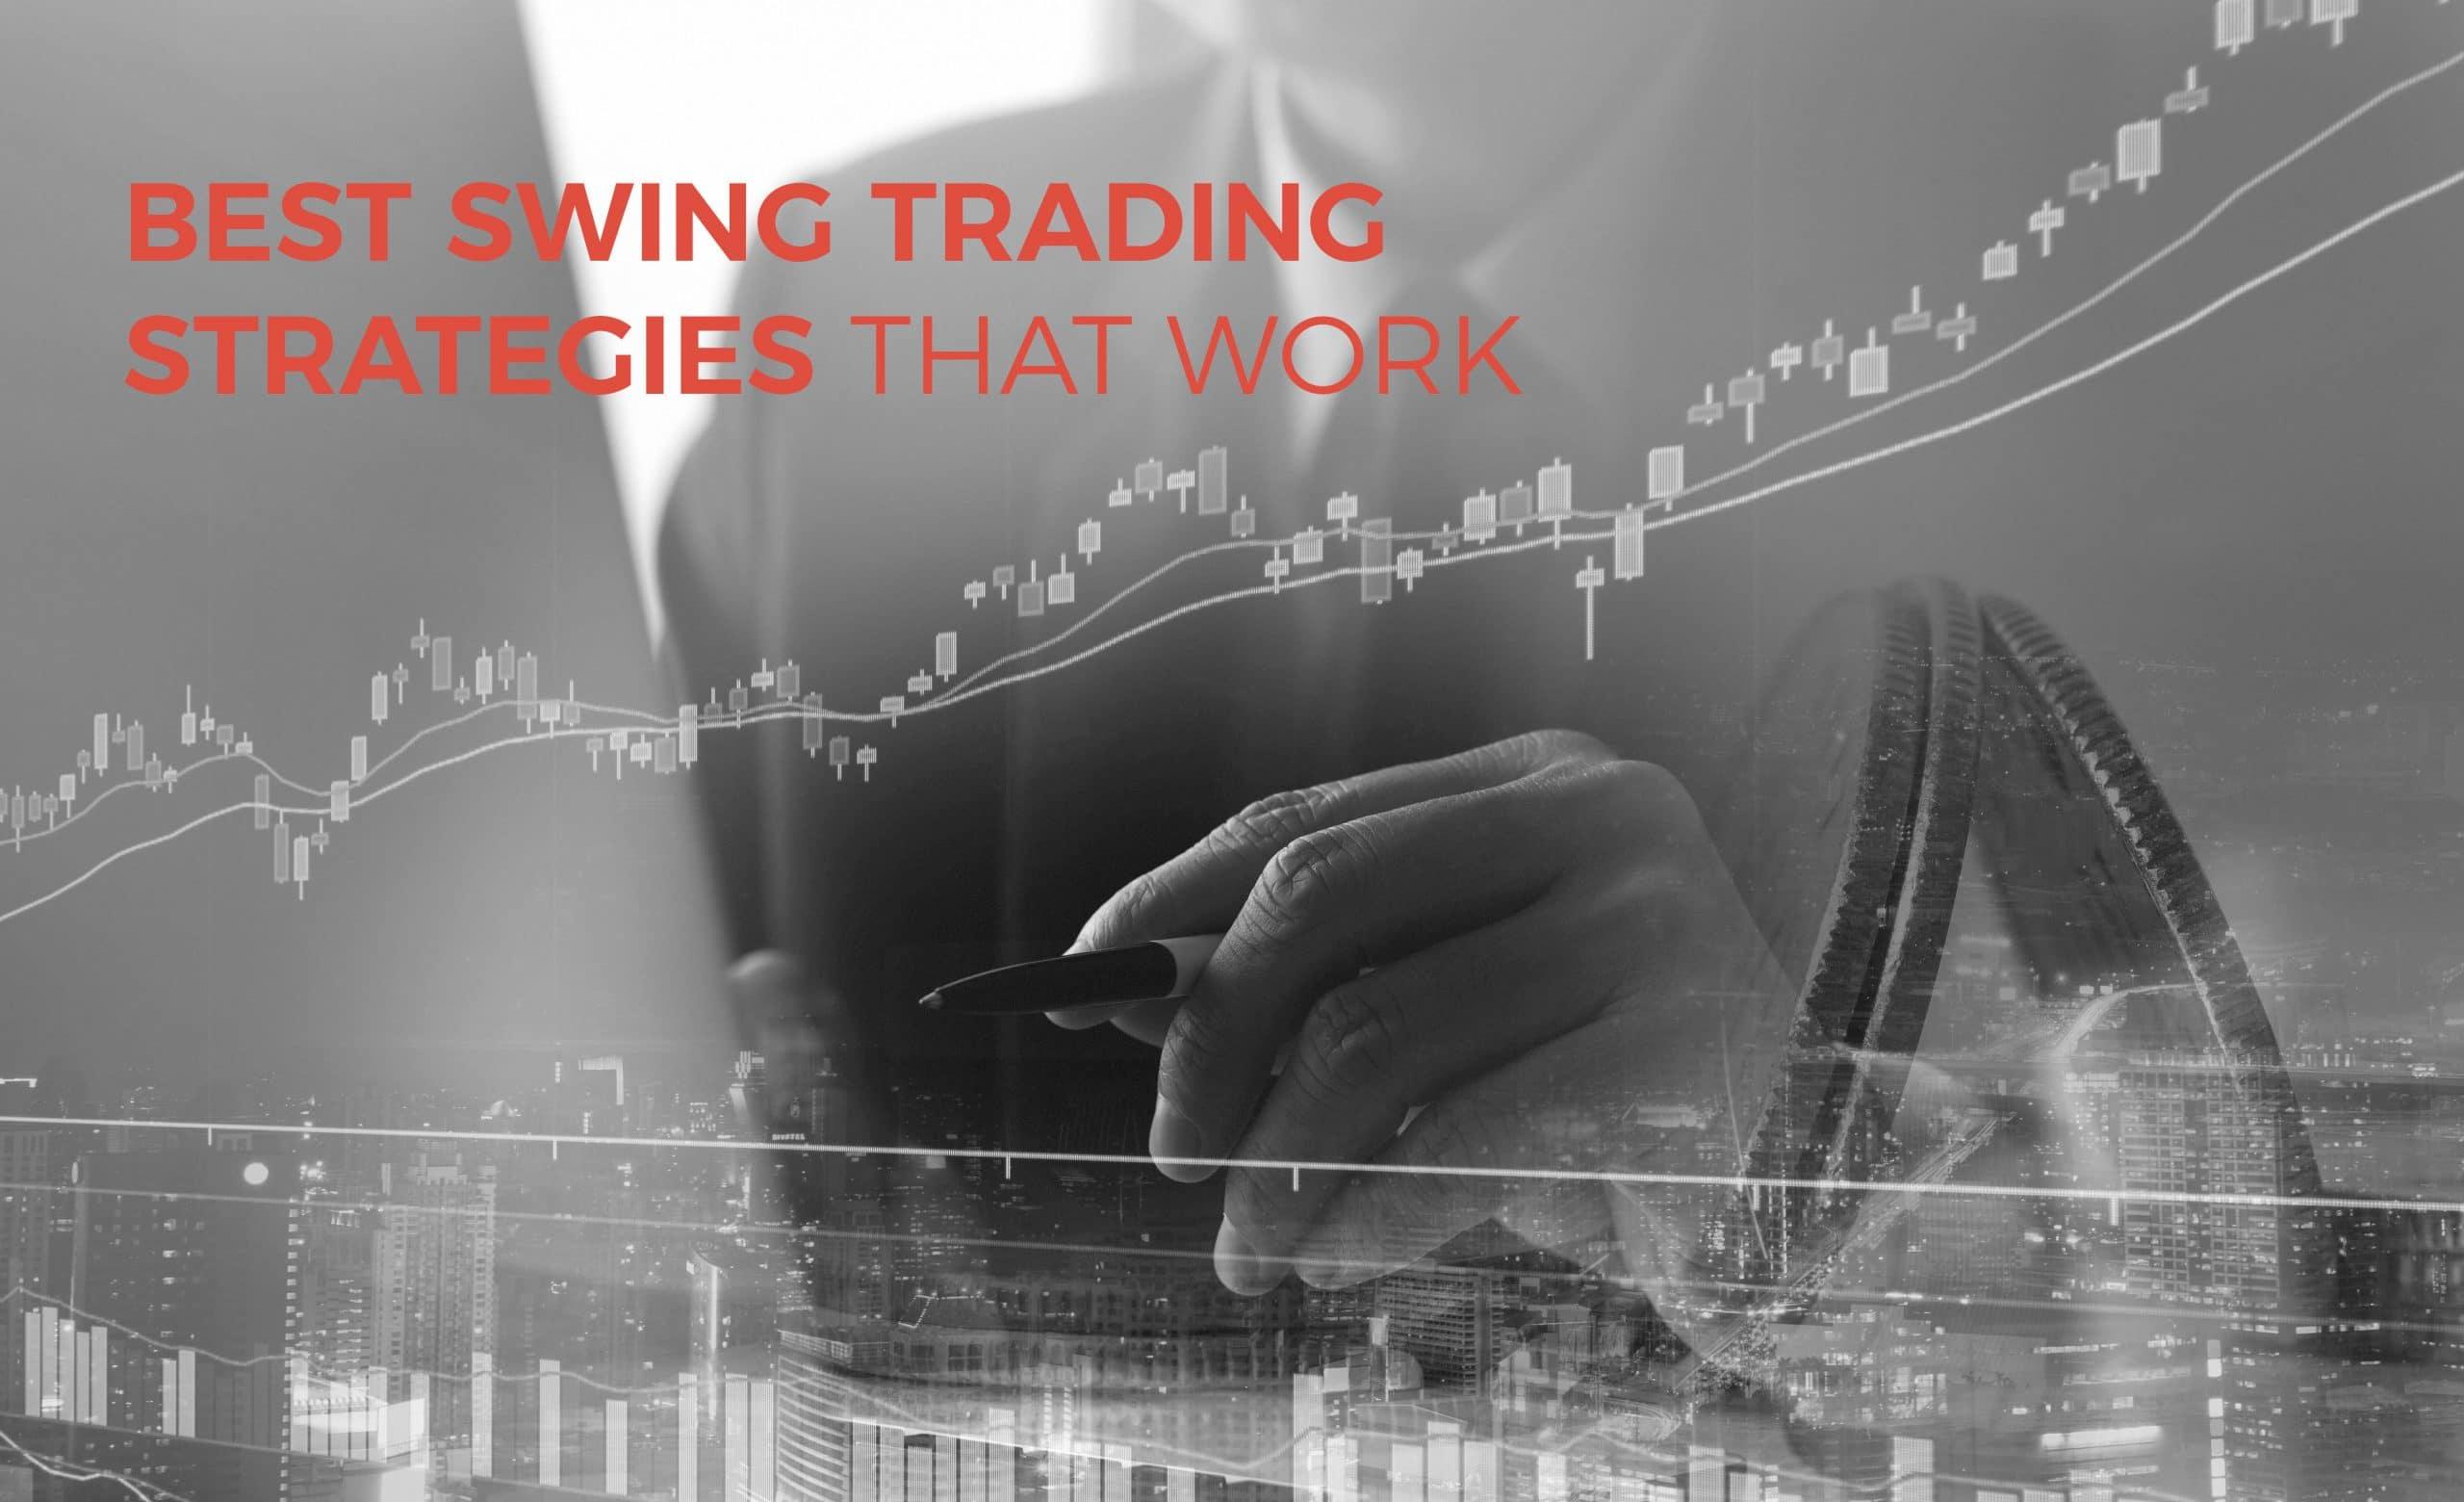 Best Swing Trading Strategies that Work